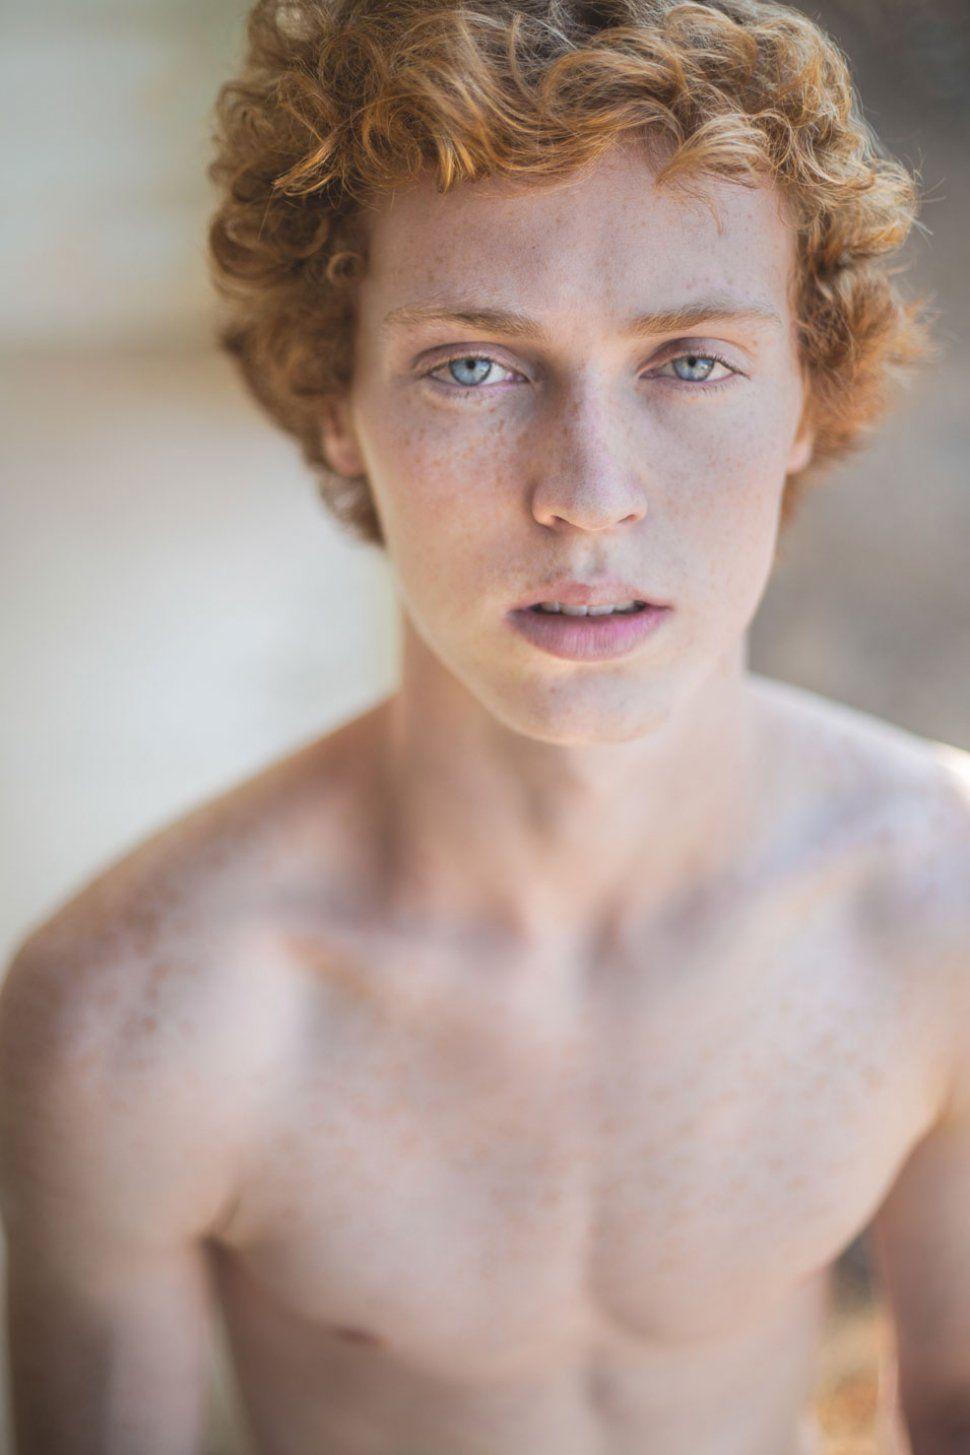 SEAN RAITNER Gray eyes, Freckles, Model